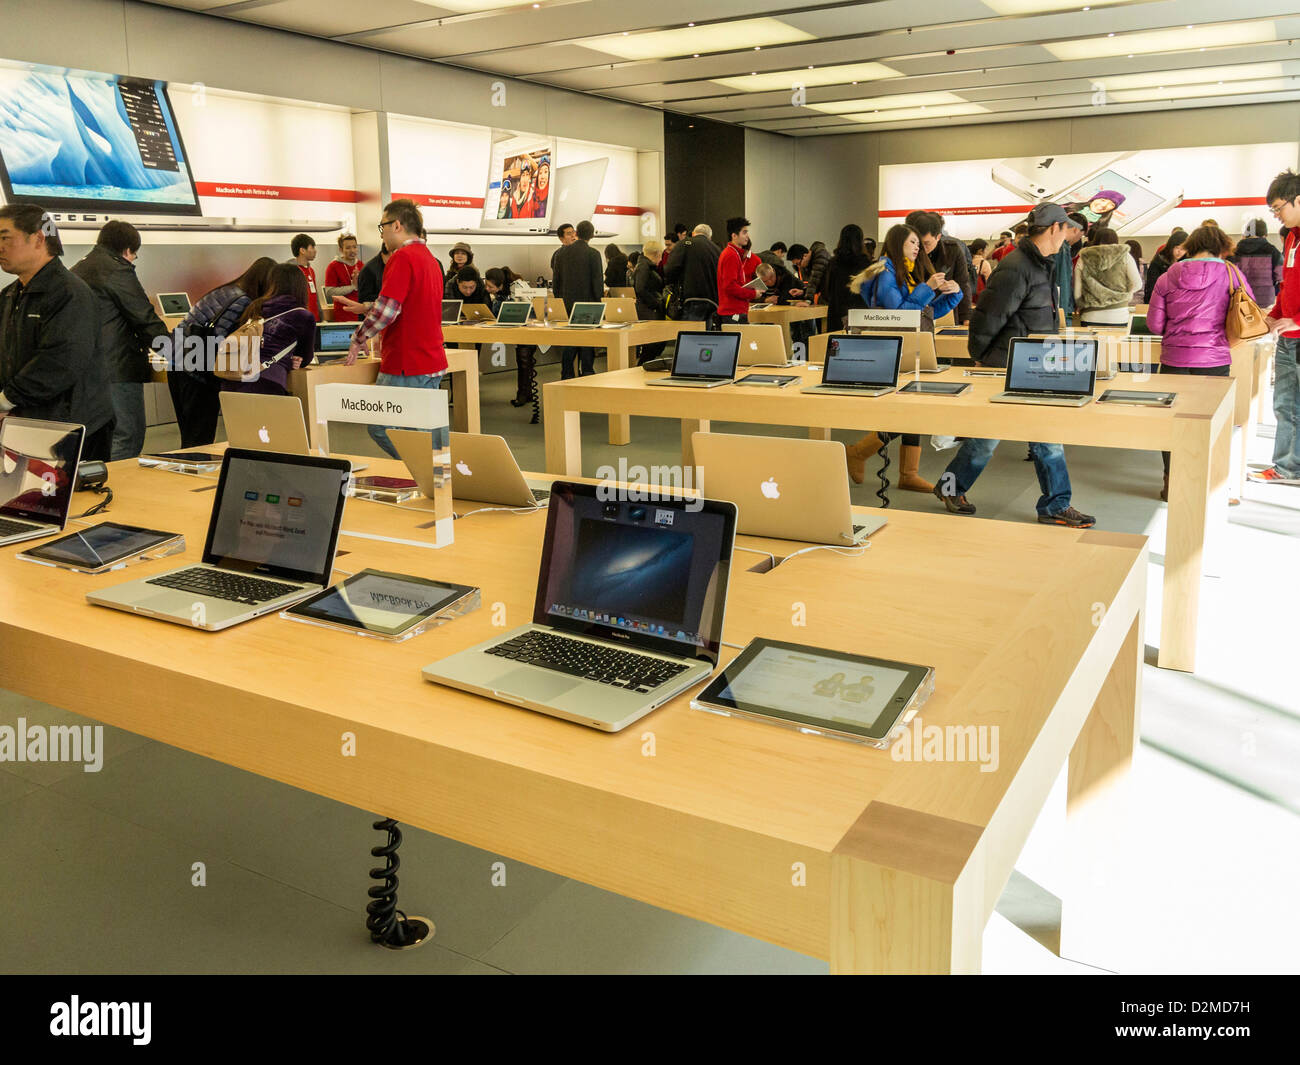 Apple Store at the IFC centre, Hong Kong - Stock Image